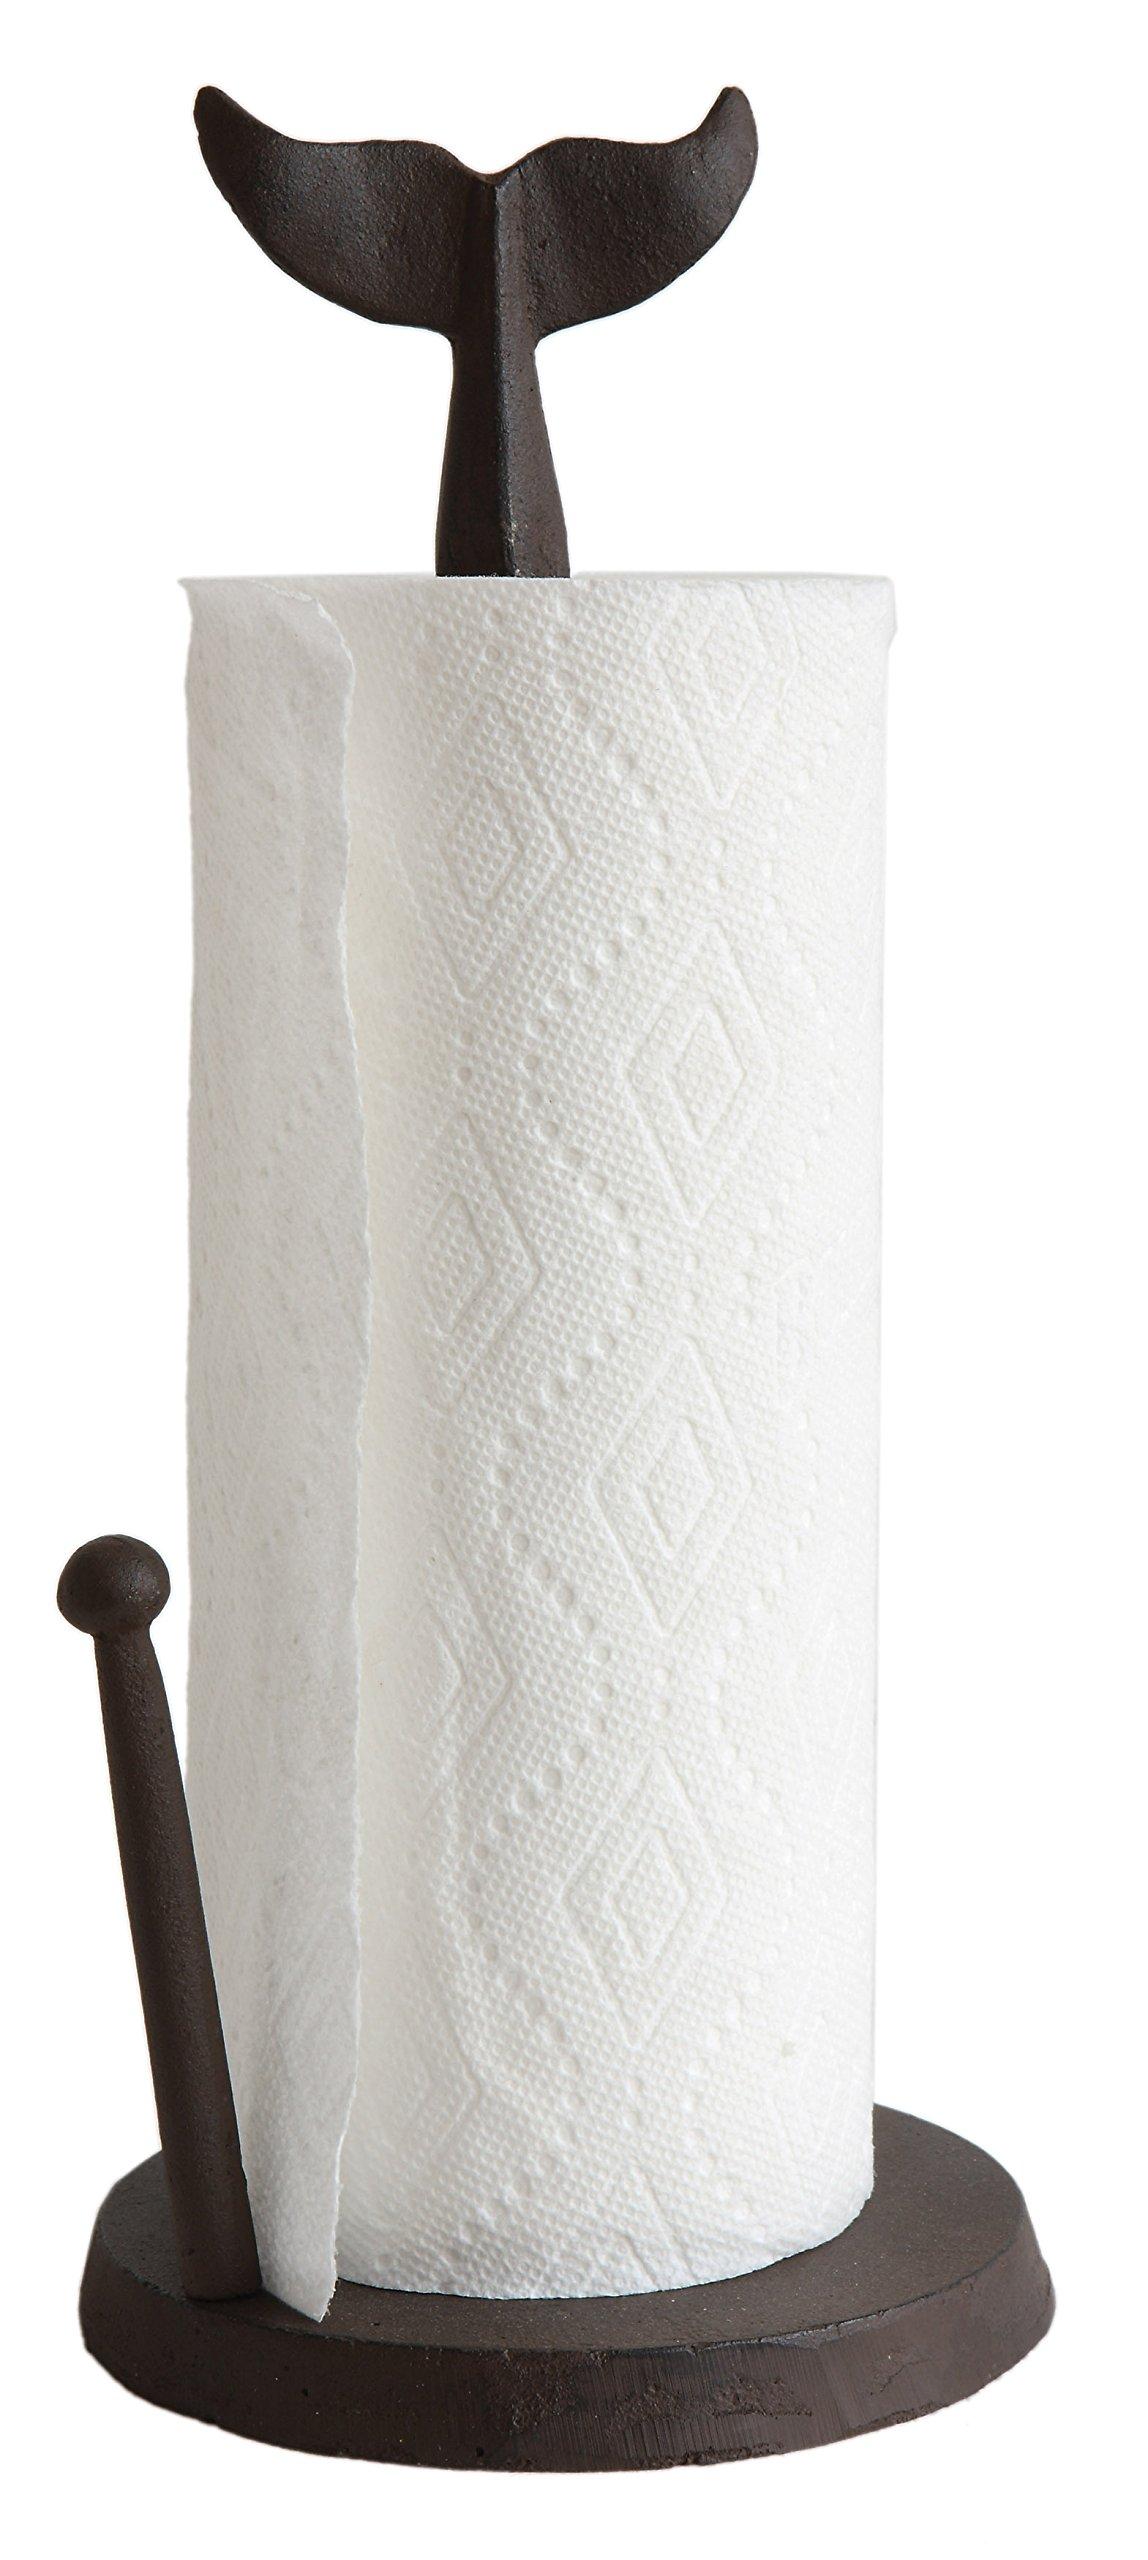 Creative Co-Op DA7224 Cast Iron Whale Tail Paper Towel Holder